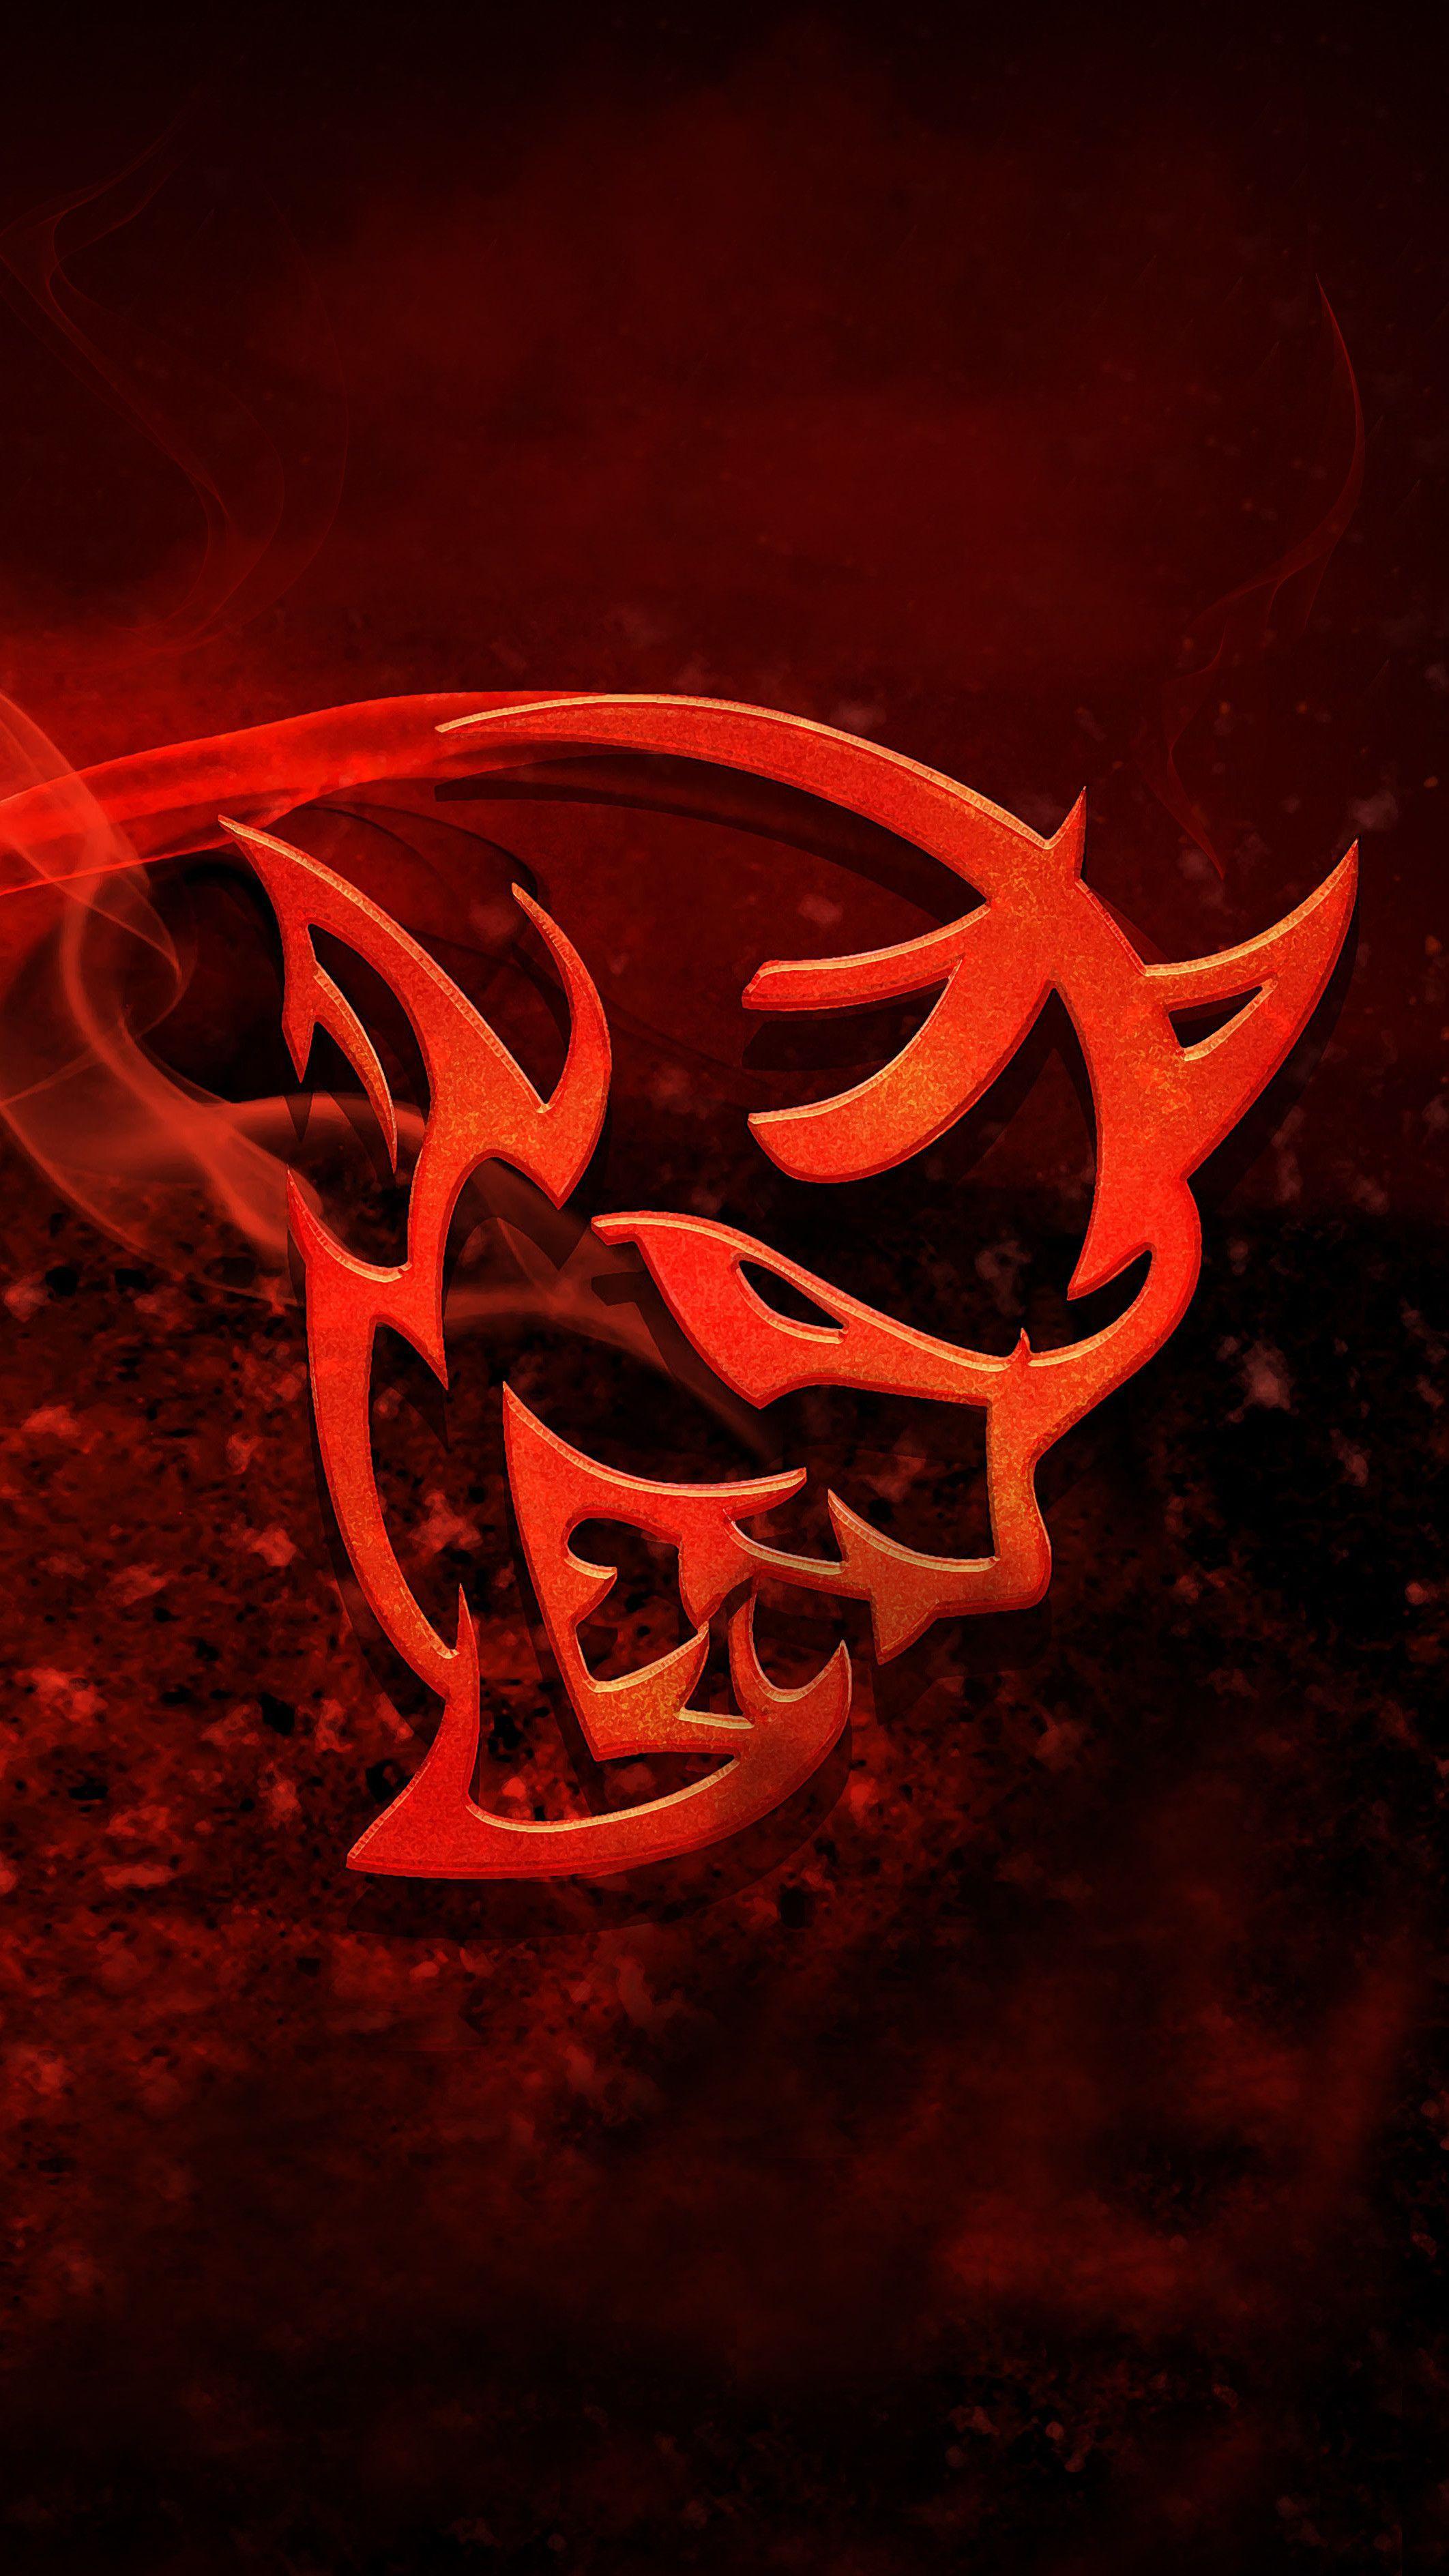 Demon Logo Wallpapers Top Free Demon Logo Backgrounds Wallpaperaccess